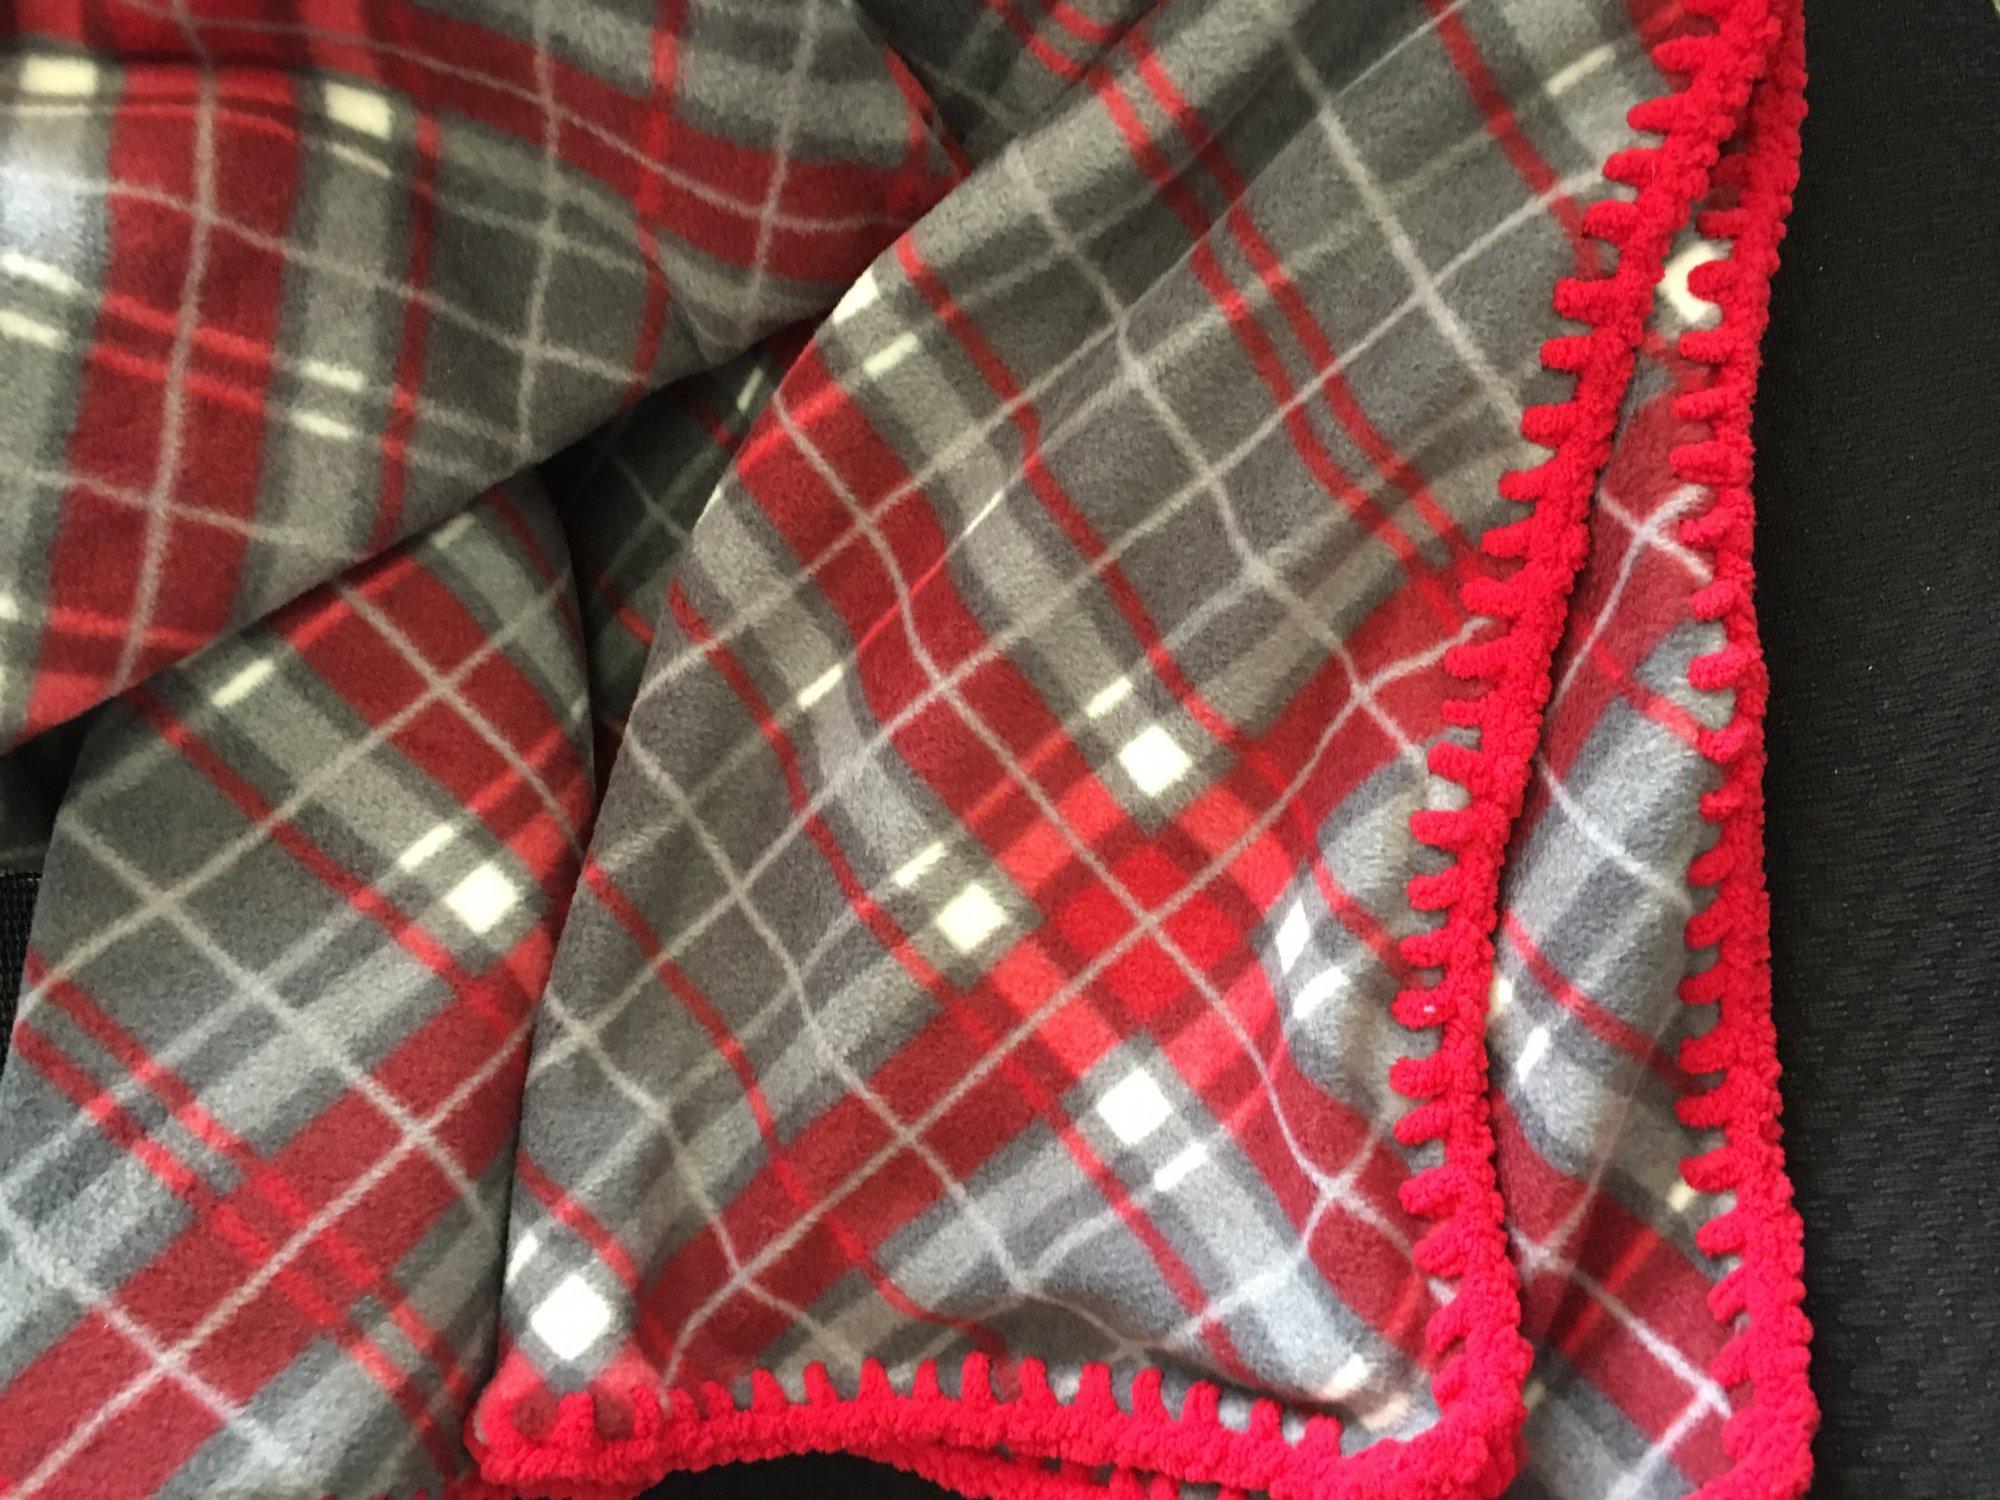 Super Plush Plaid Fleece Blanket W Crochet Border 50 X 60